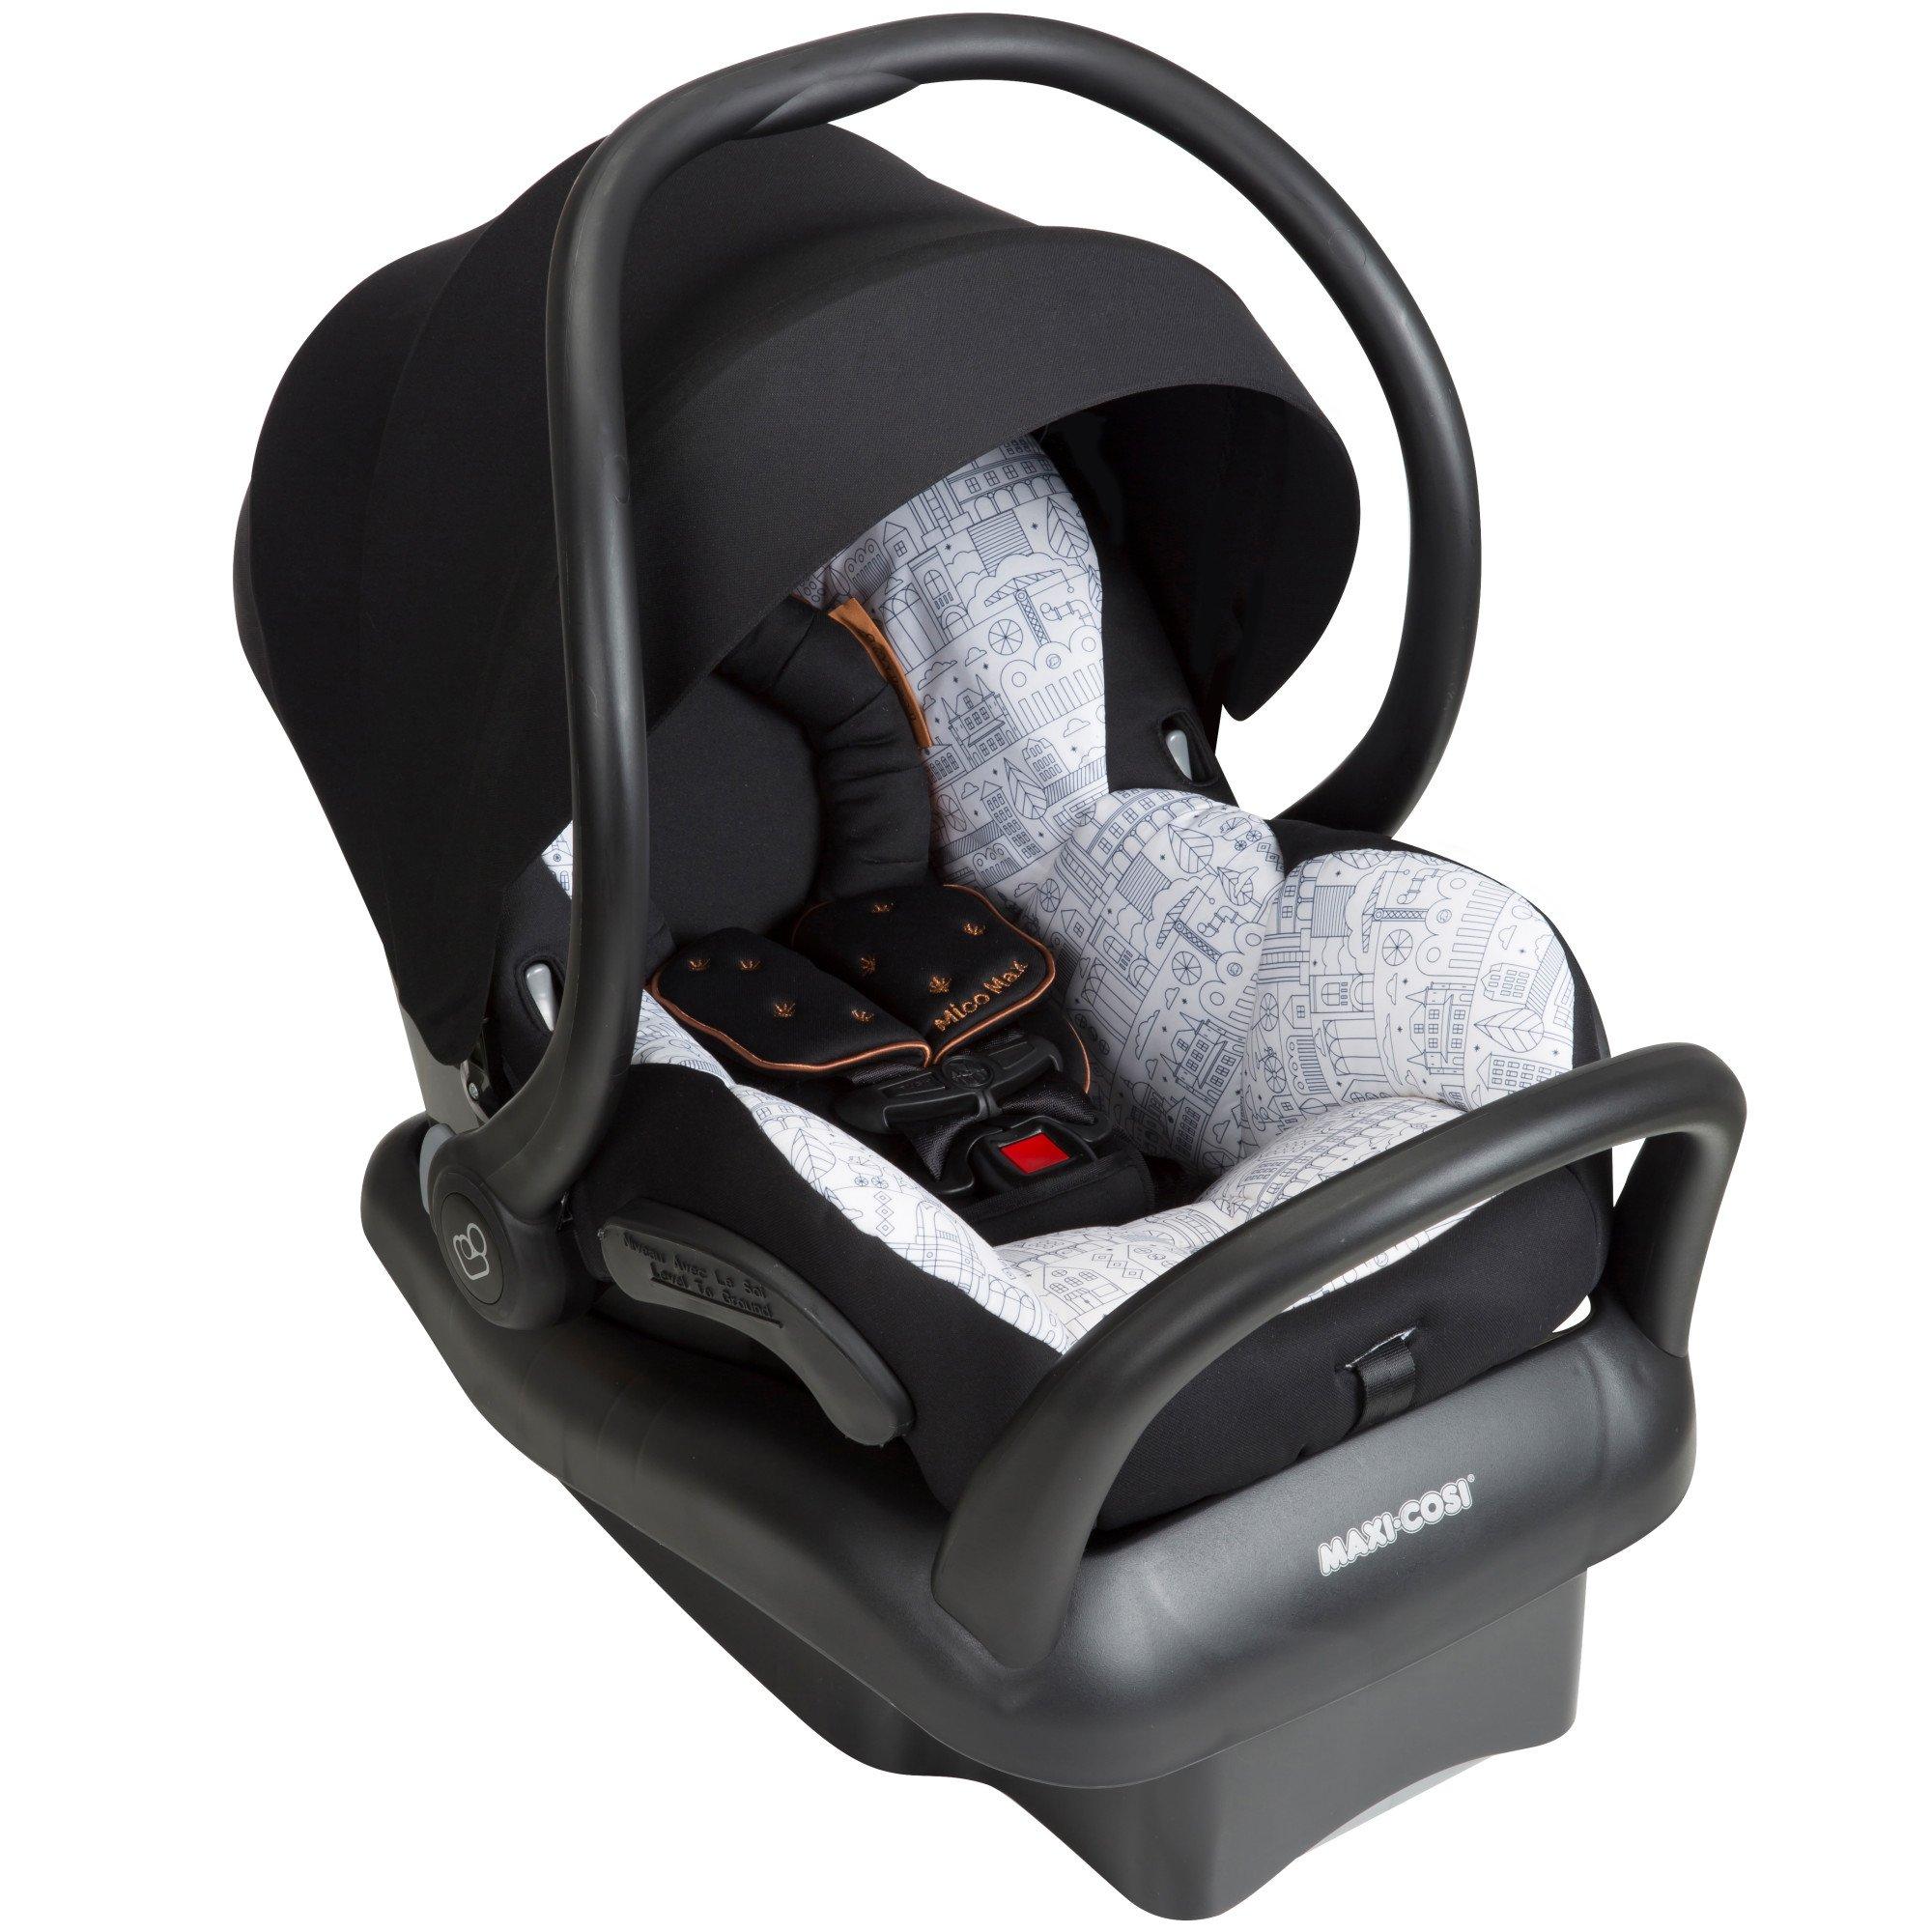 Maxi-Cosi Mico Max 30 Special Edition Car Seat, City Motif